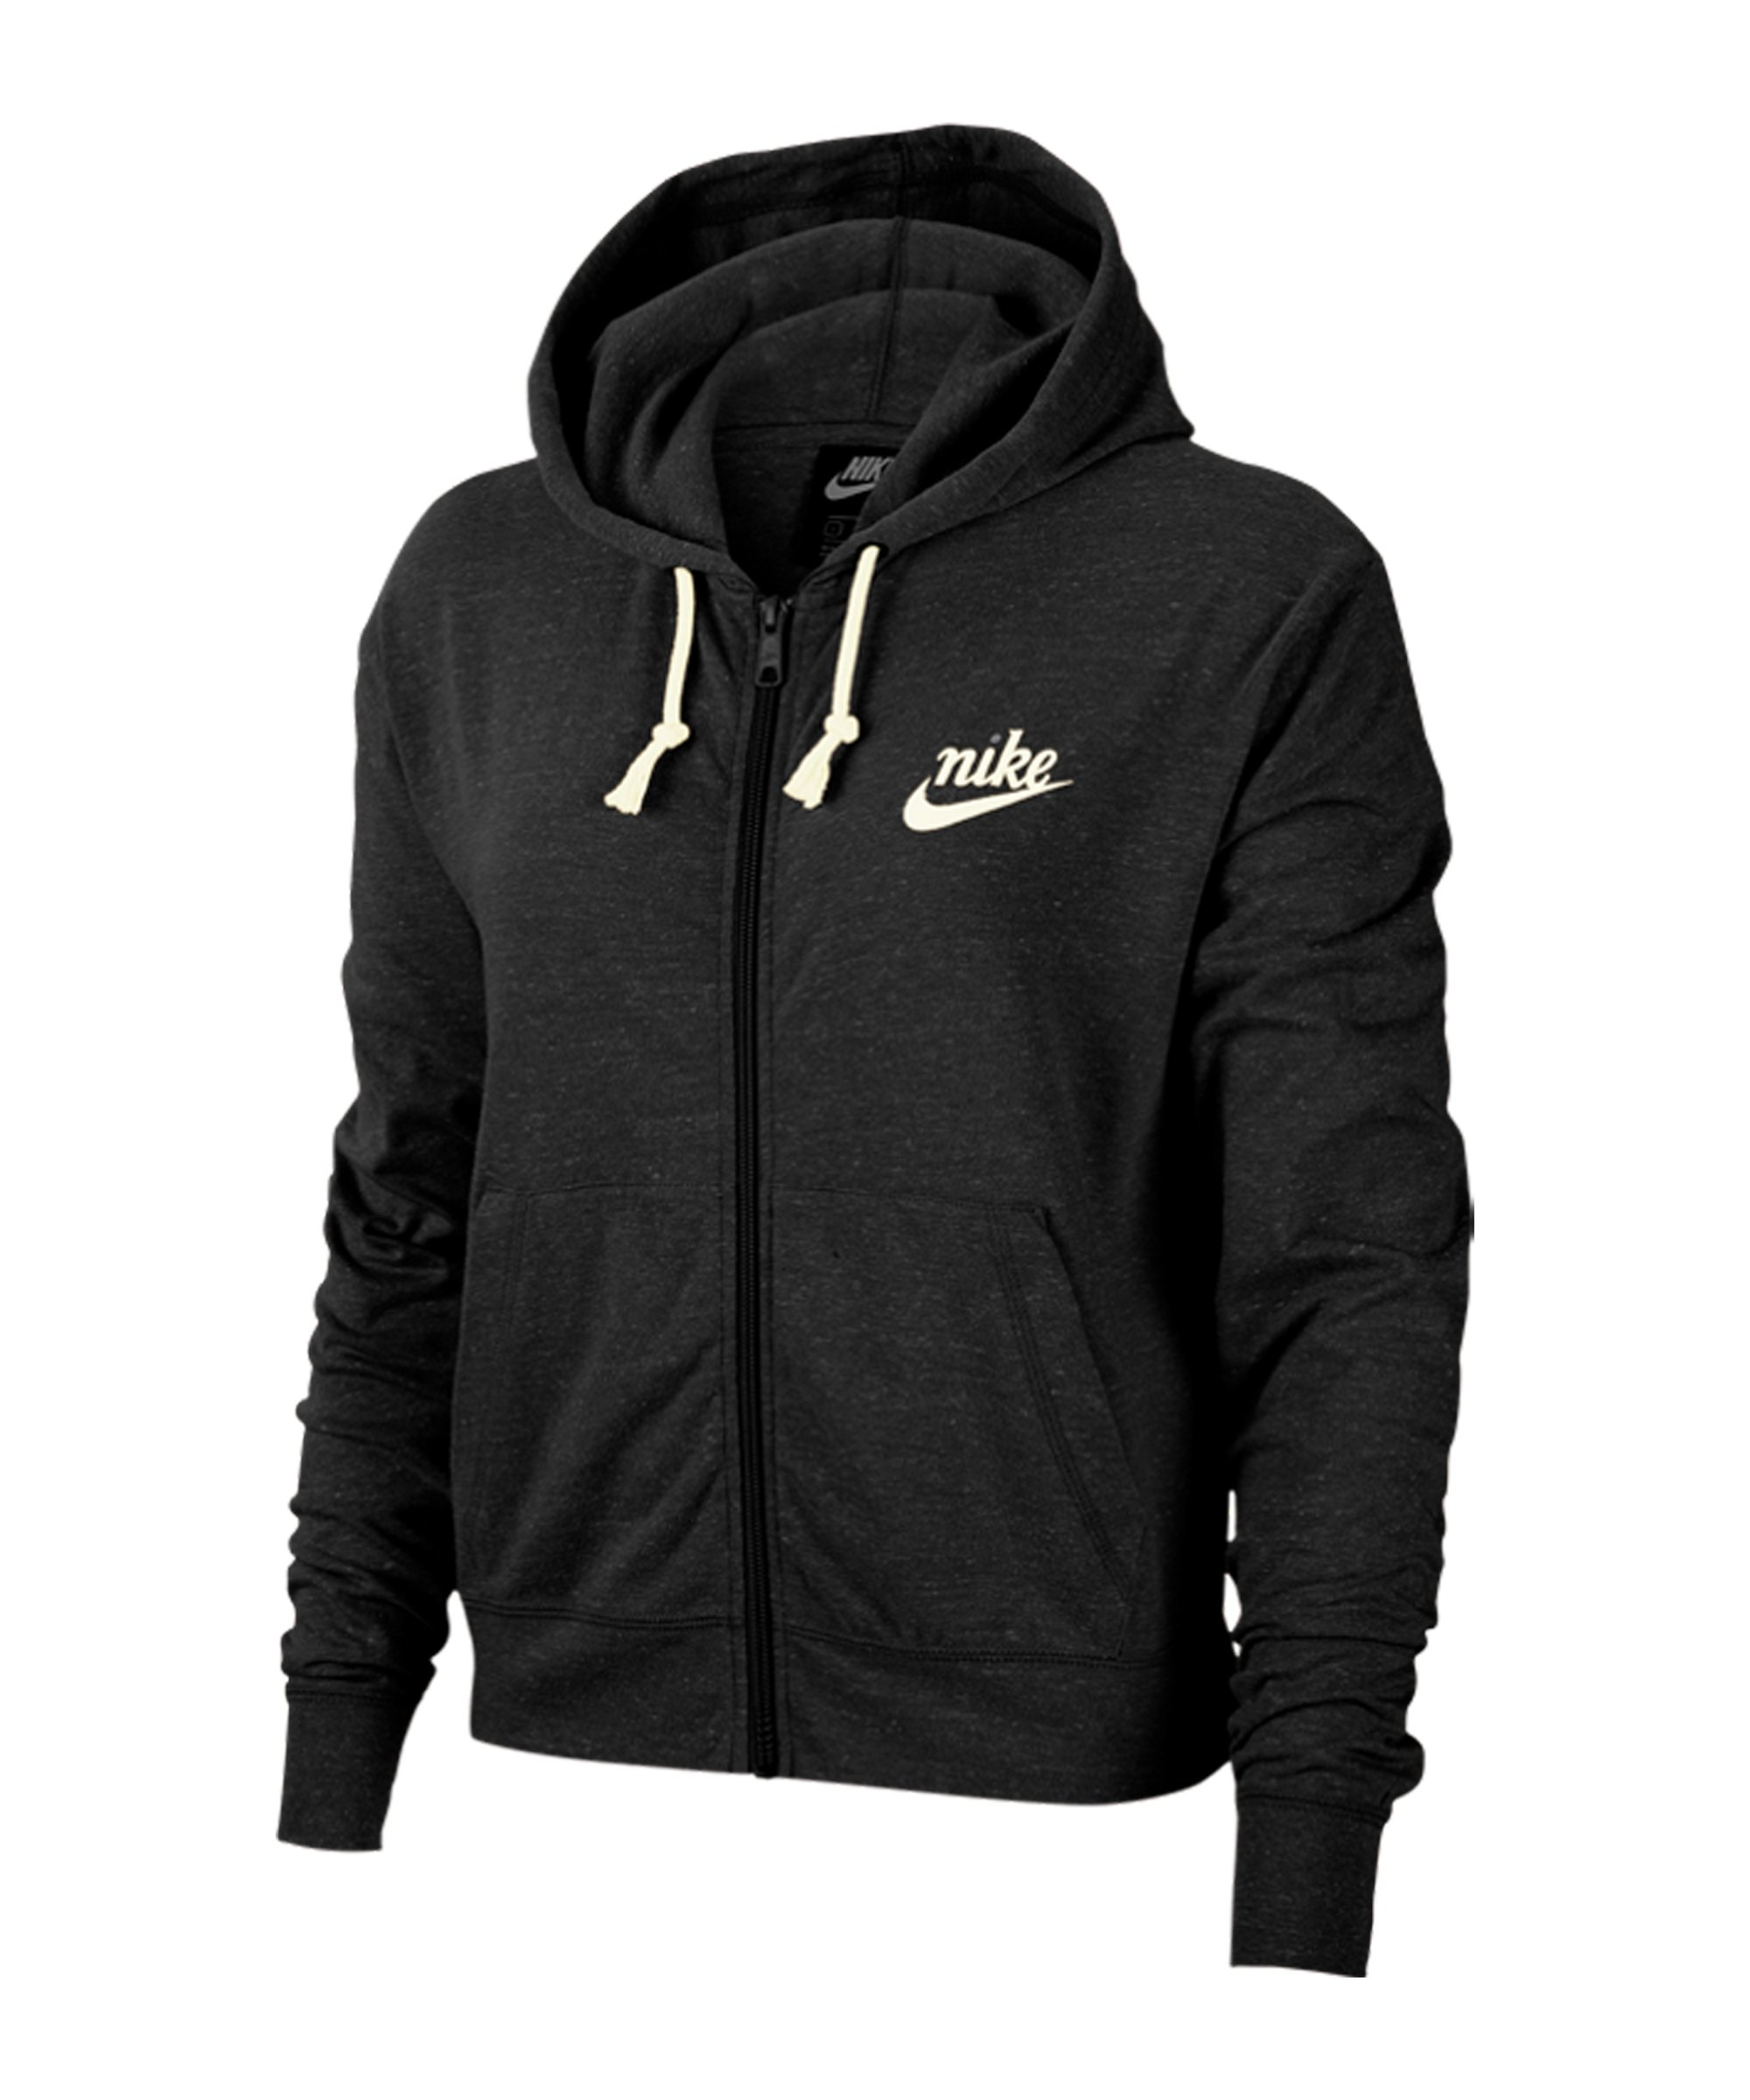 Nike Gym Vintage Kapuzenjacke Damen Schwarz F010 - schwarz